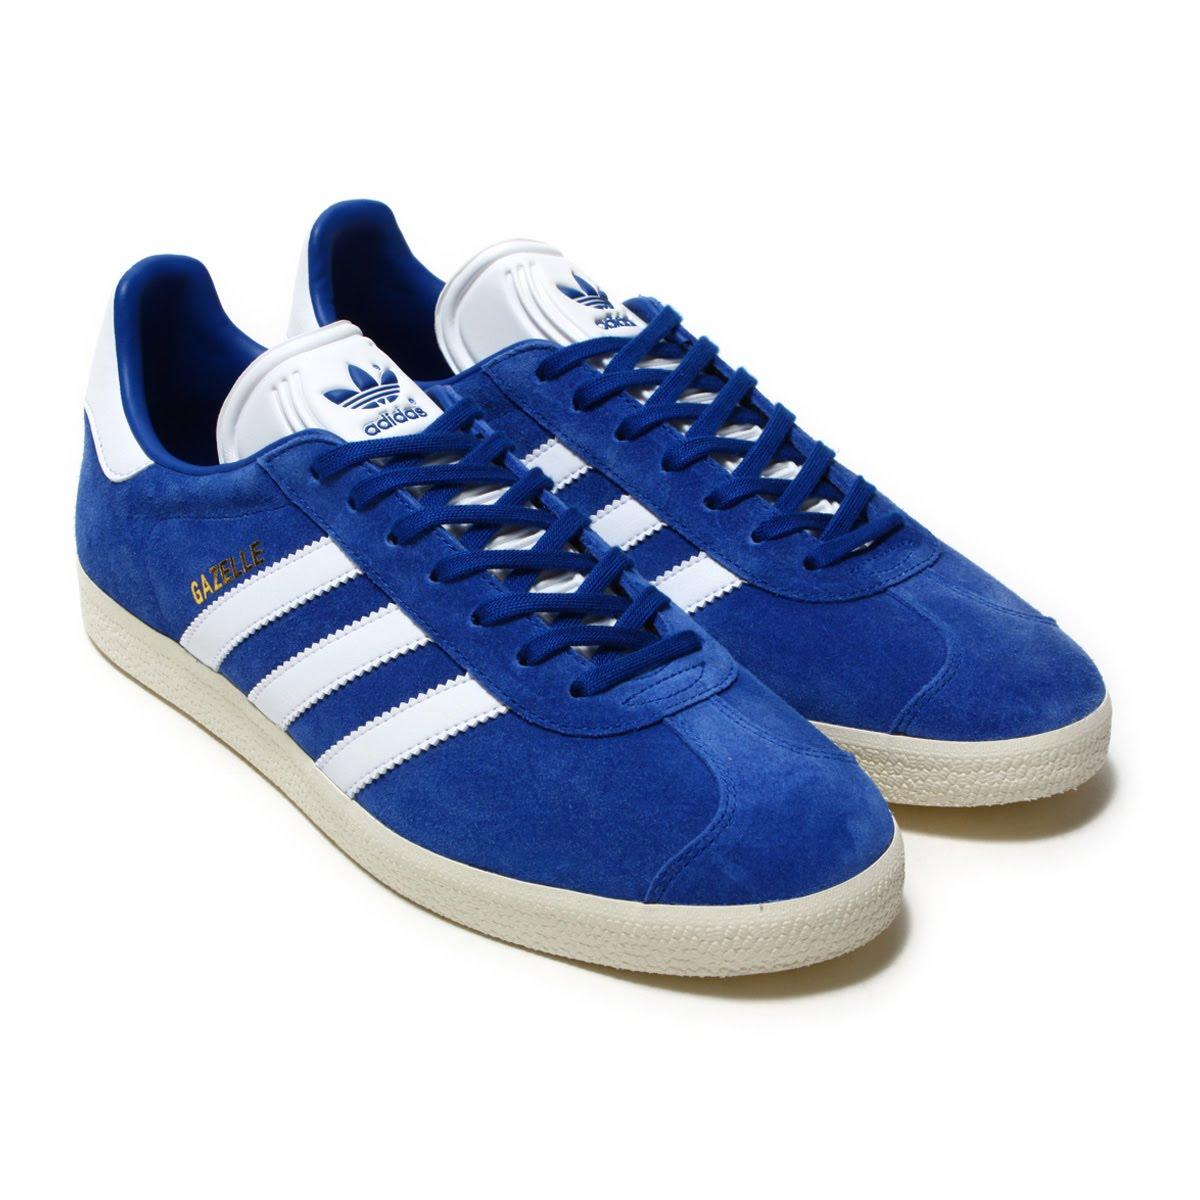 wholesale dealer 56515 0f2cf adidas Originals GAZELLE (Adidas originals gazelle) Collegiate Royal    Running White   Cream  ...